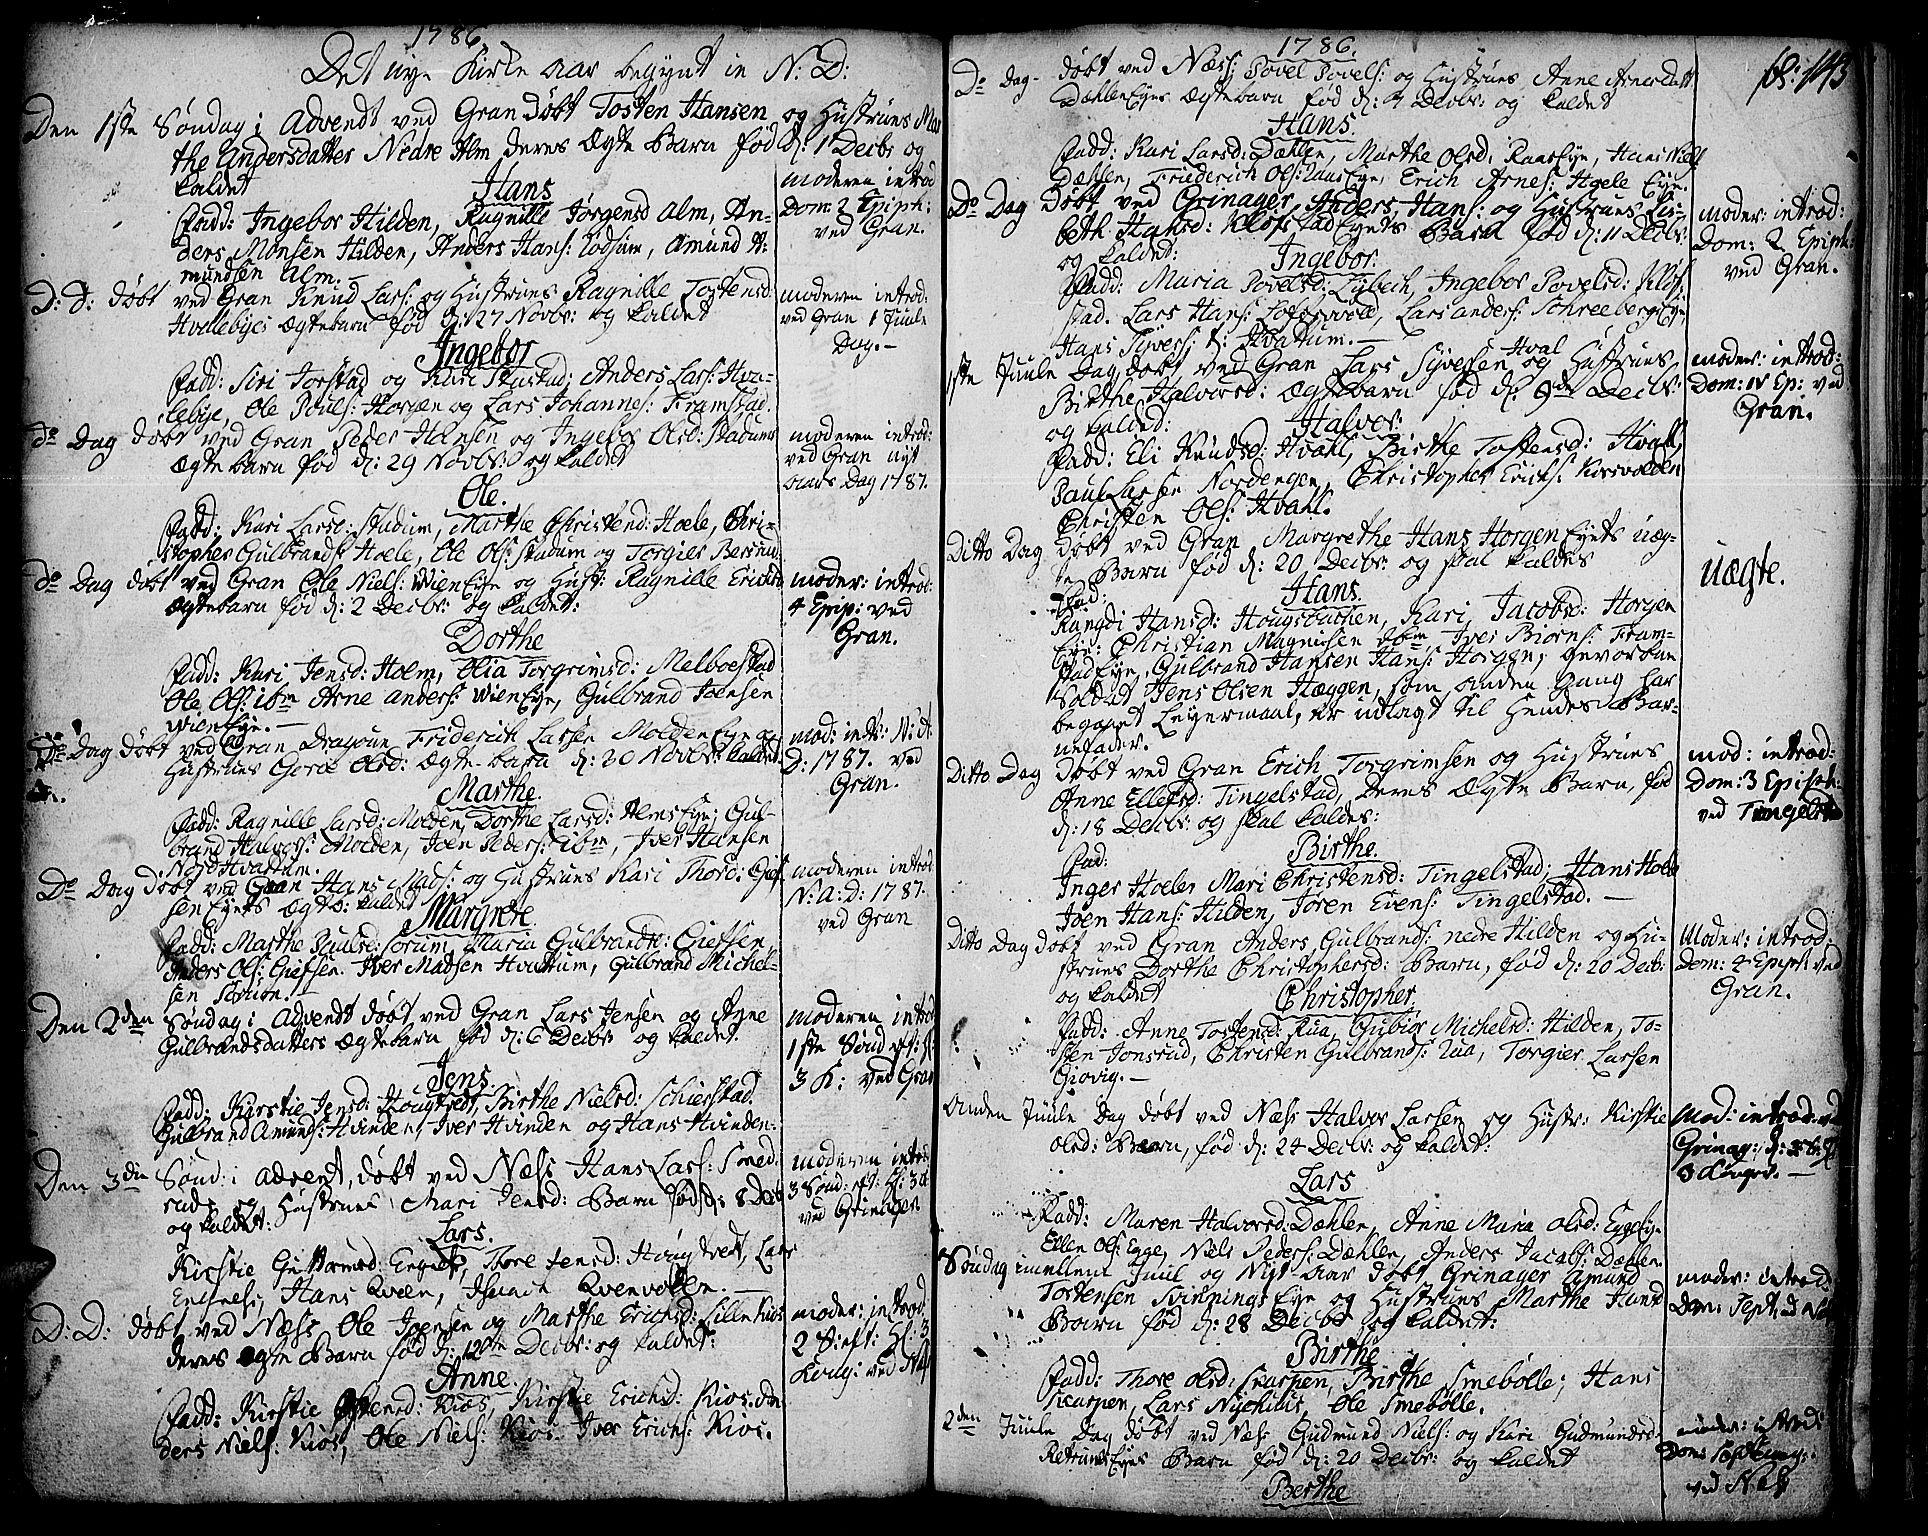 SAH, Gran prestekontor, Ministerialbok nr. 5, 1776-1788, s. 145